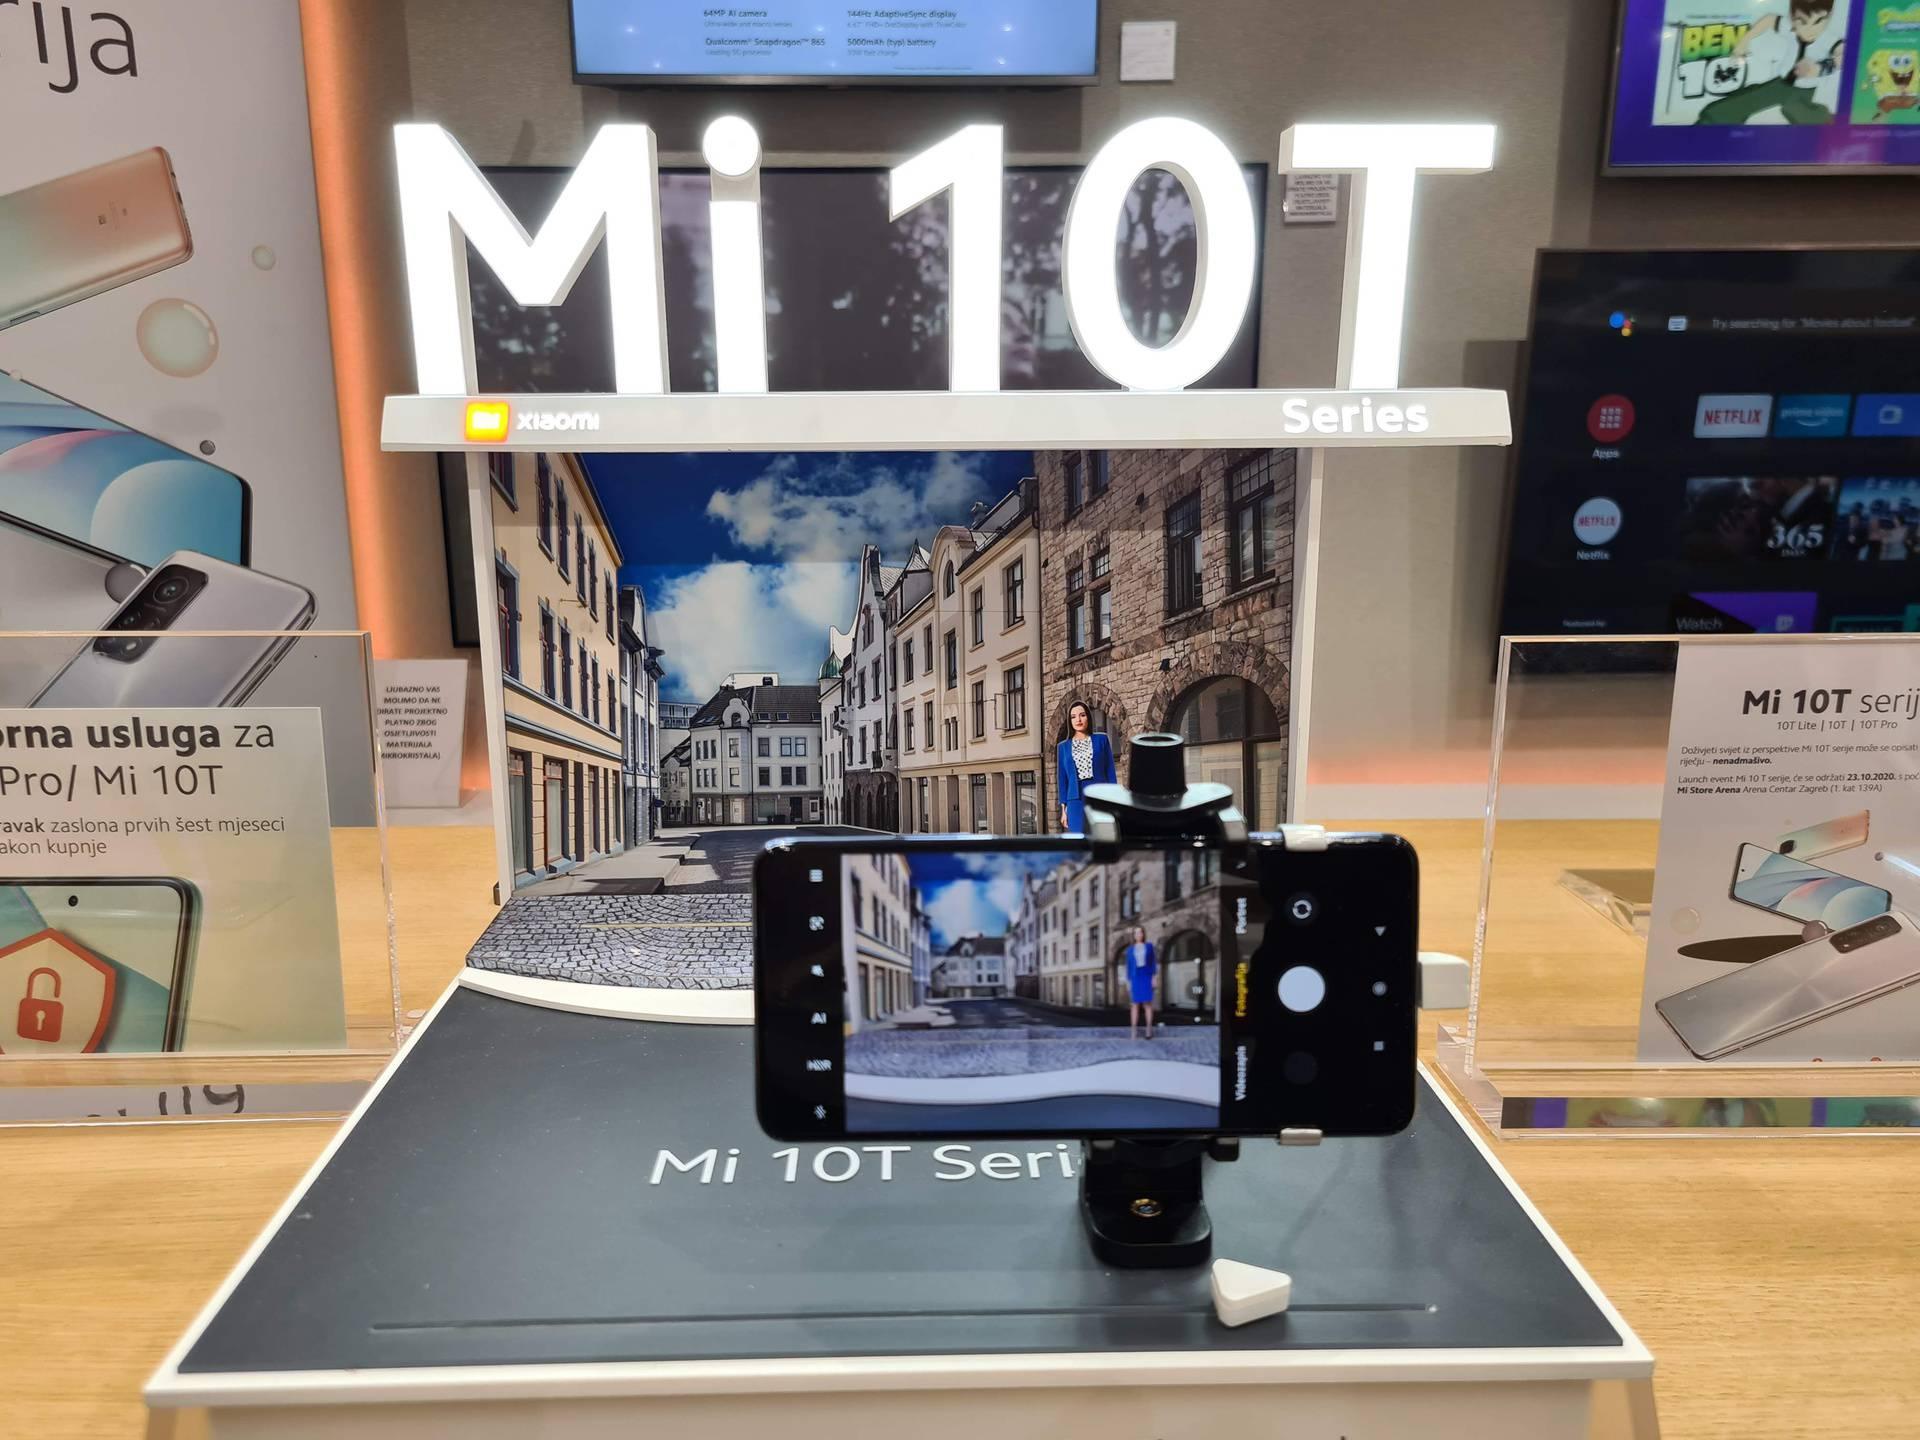 Xiaomi Mi 10T nakrcan moćnim hardverom stigao i u Hrvatsku